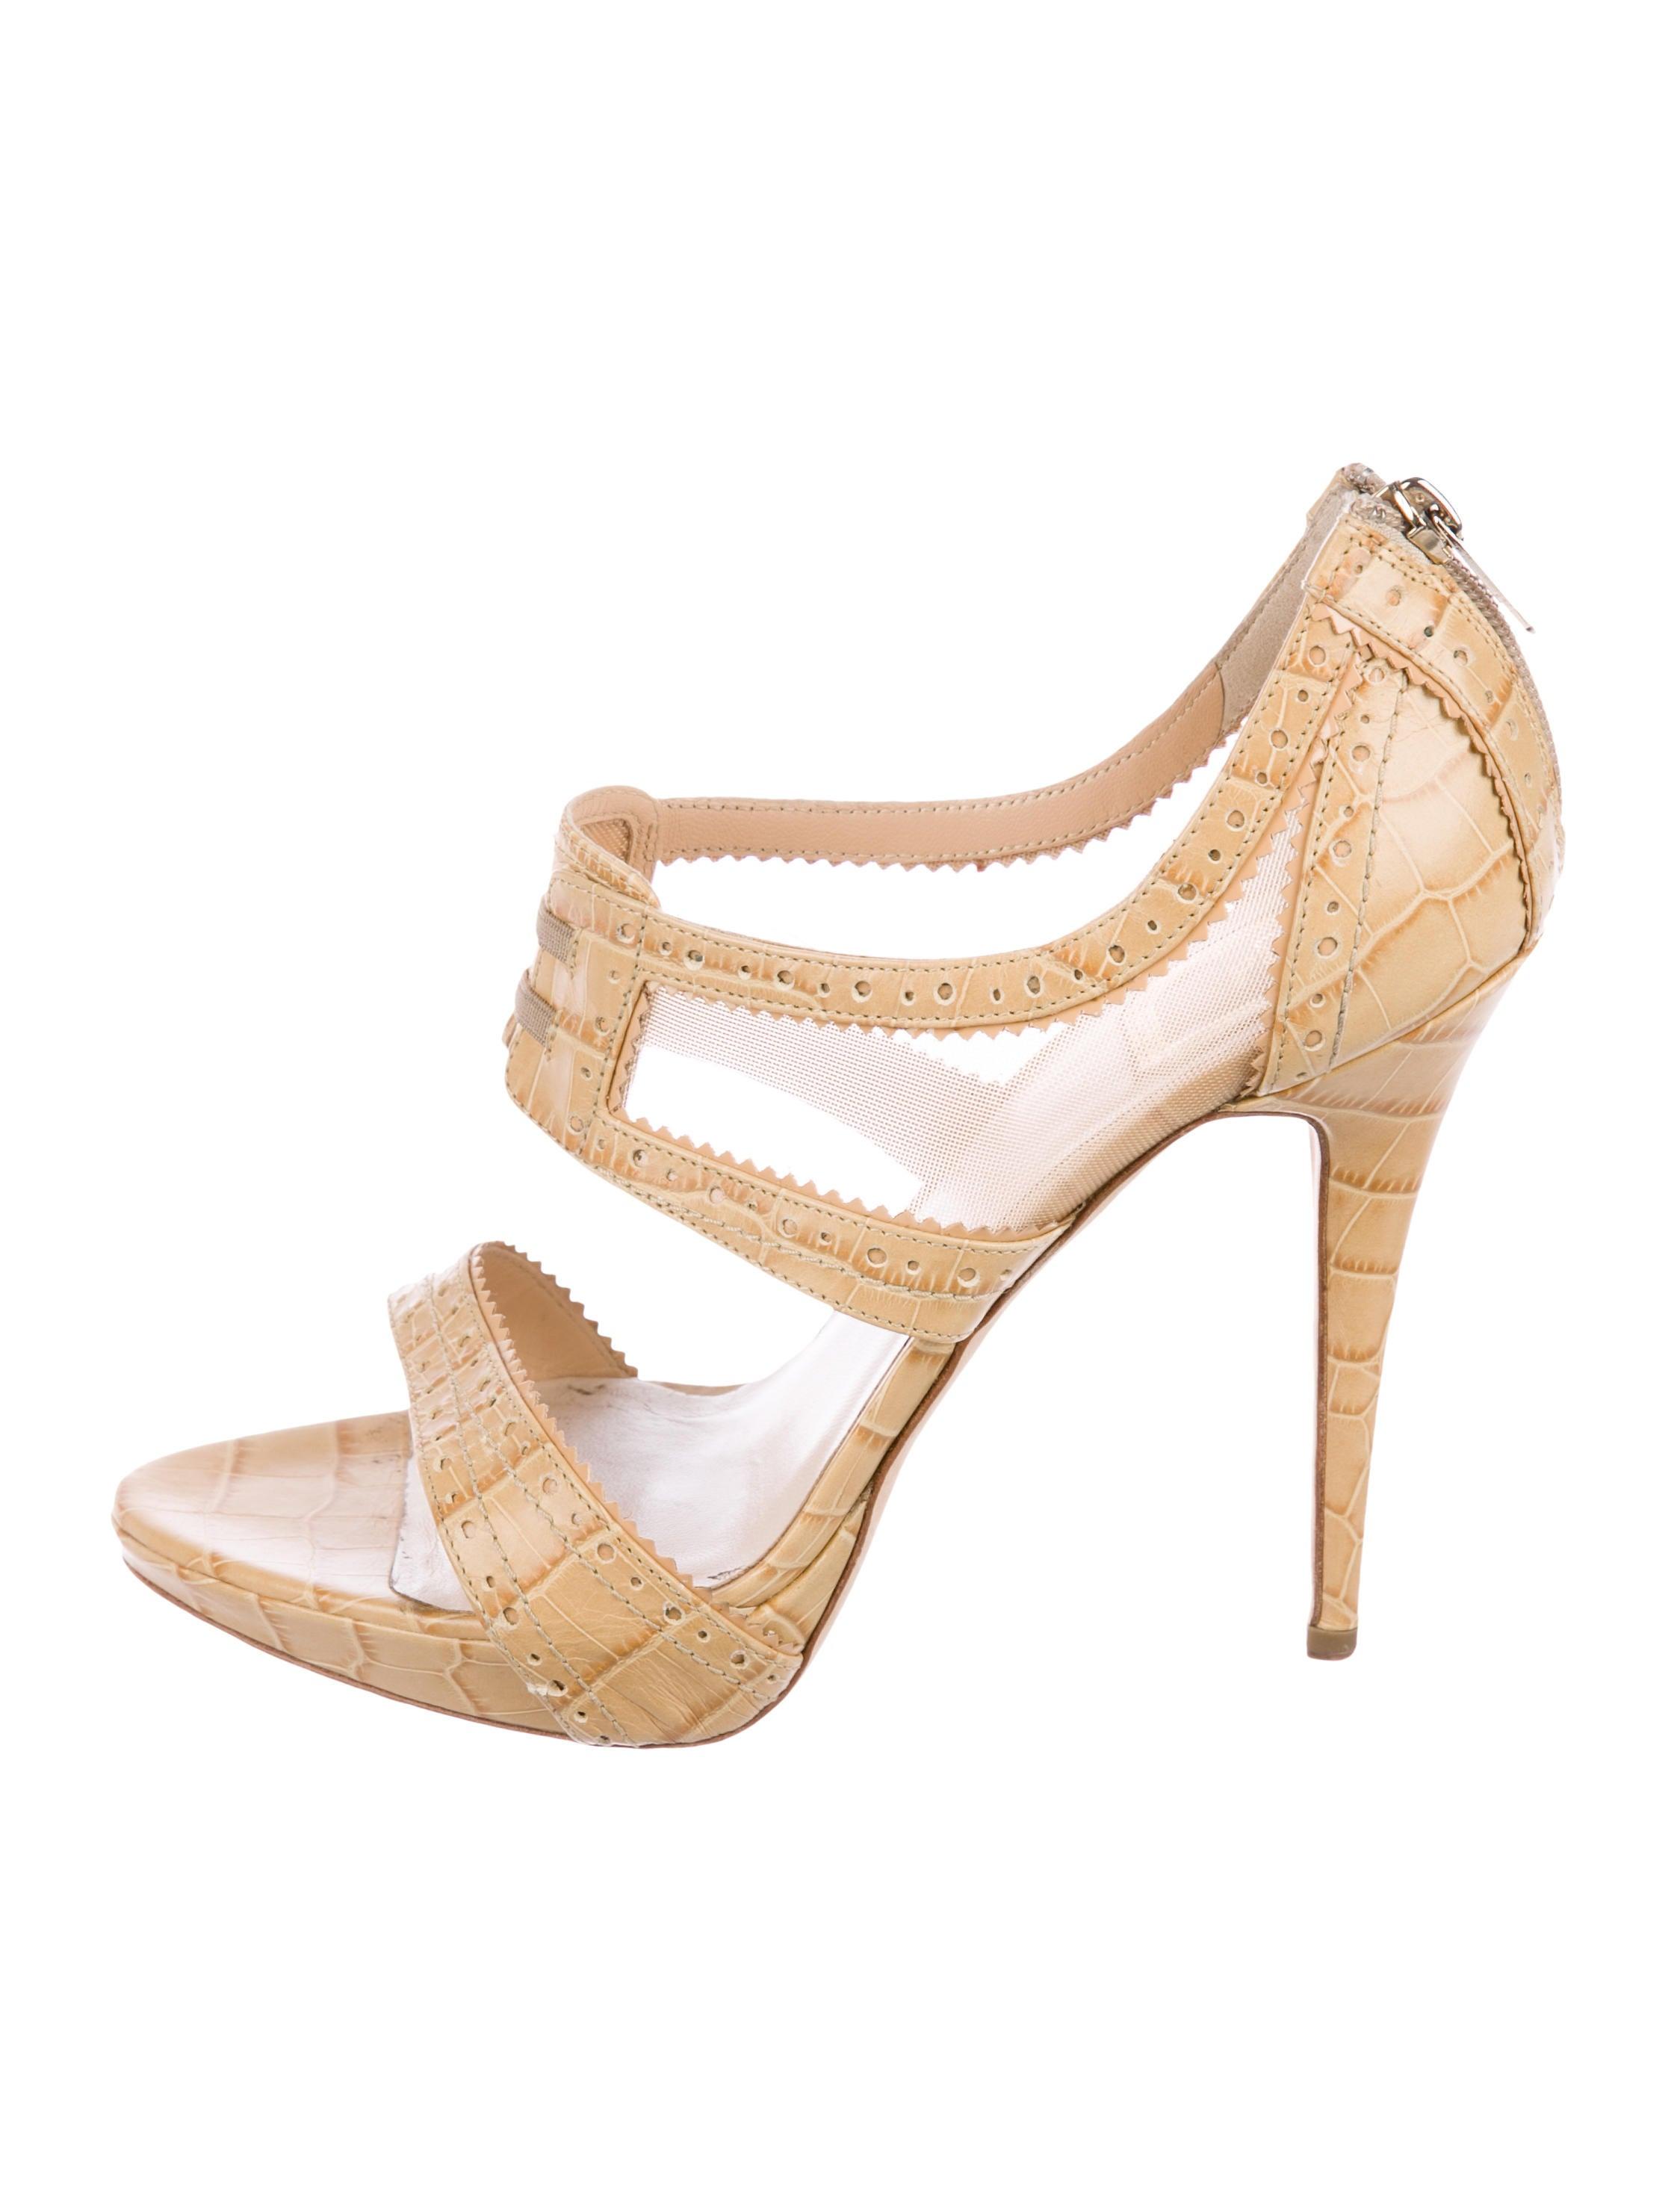 Christian Dior Bonnie Derby Leather Sandals discounts cheap price discount sneakernews nFUzwuAF